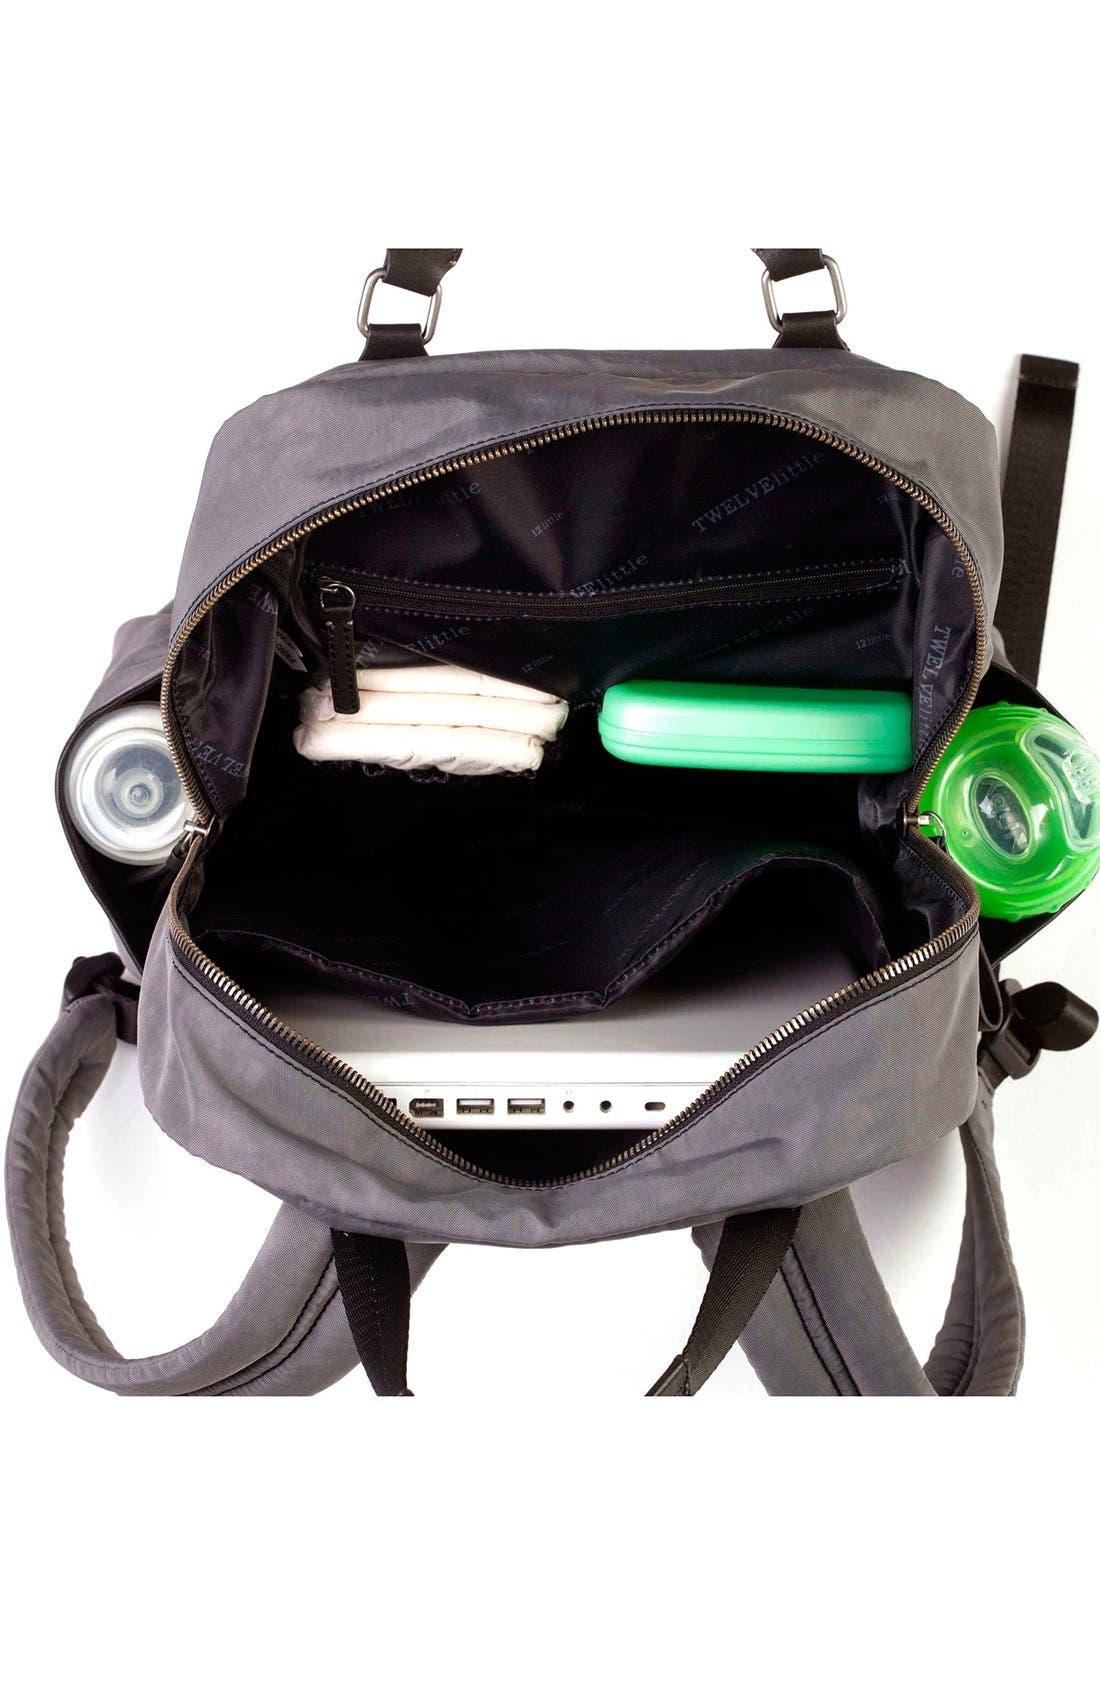 'Courage' Unisex Backpack Diaper Bag,                             Alternate thumbnail 5, color,                             020